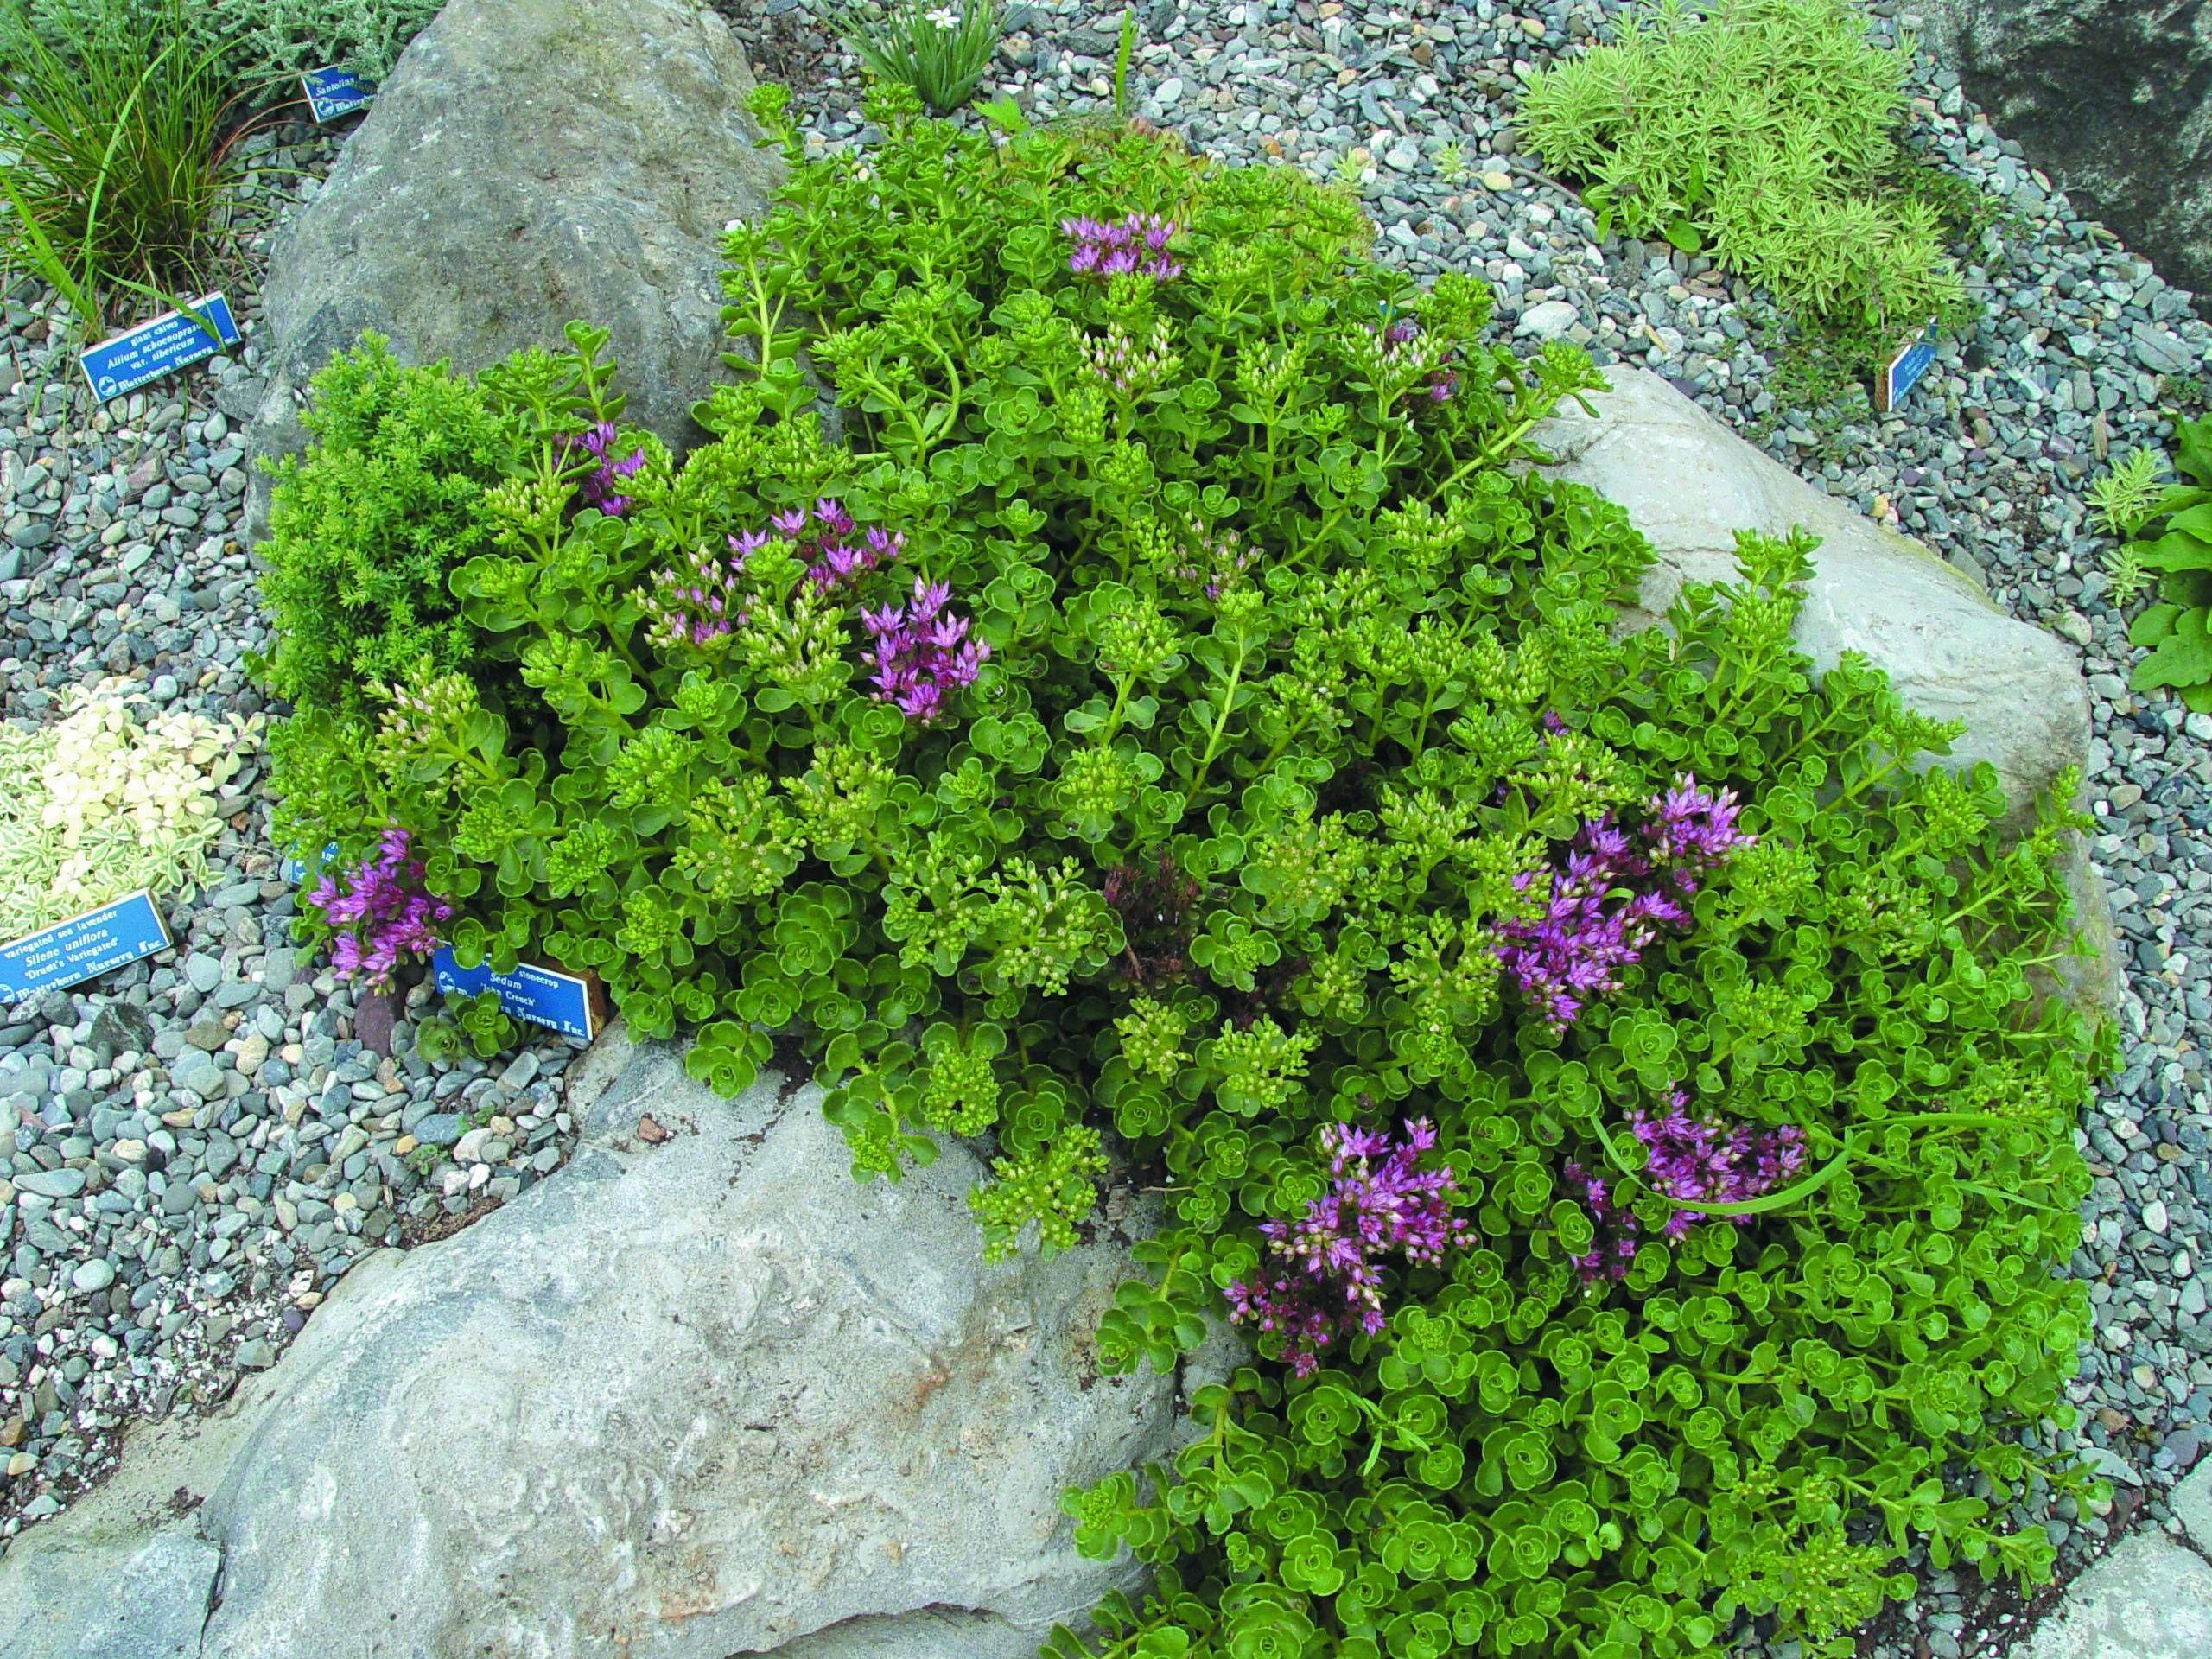 Sedum Spurium 'john Creech' I Like The Bright Green With The Purple Flowers!